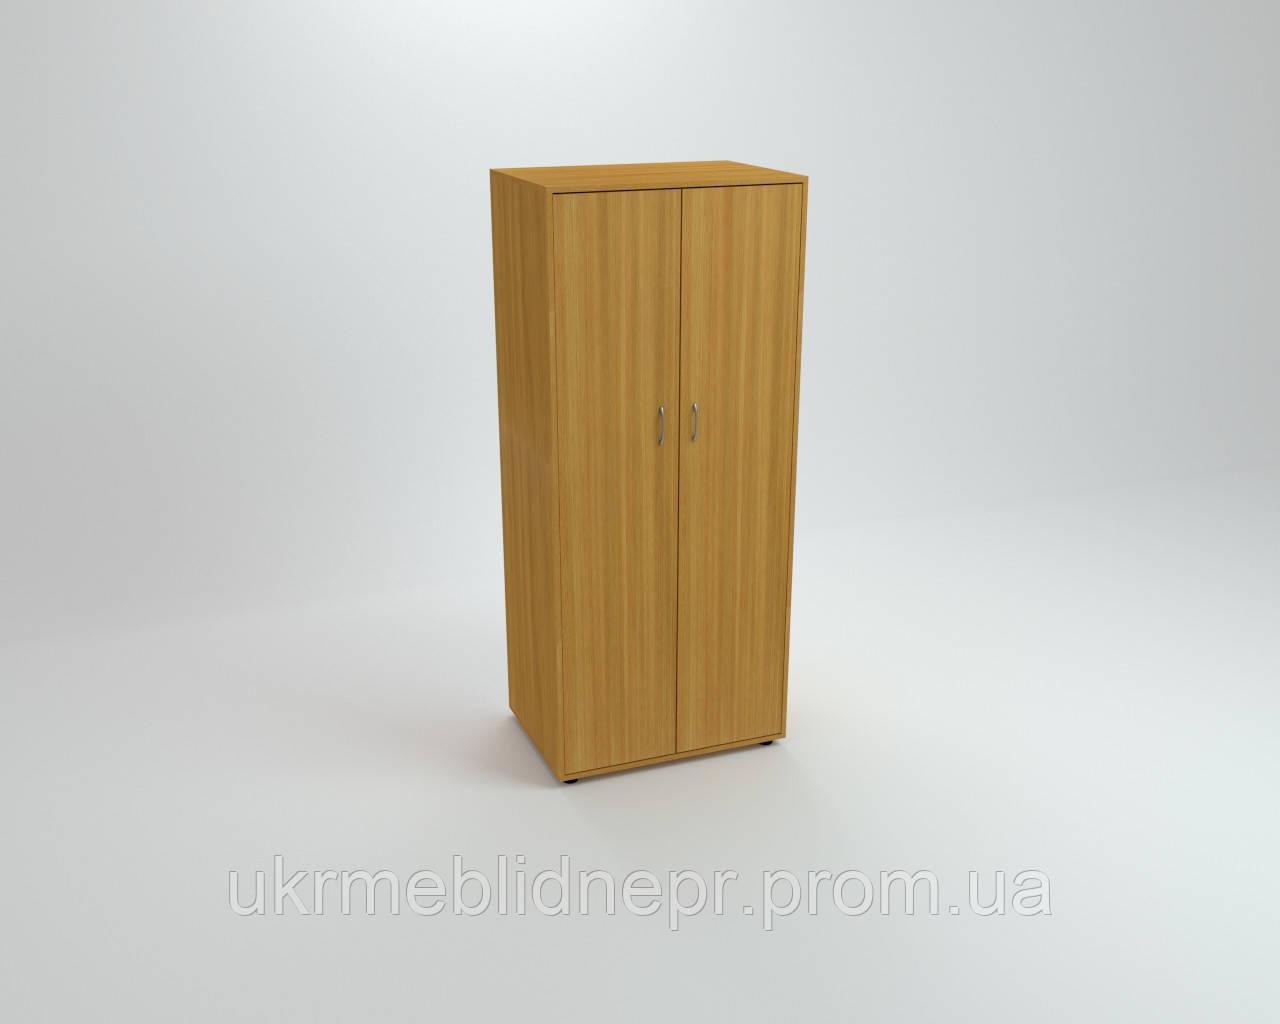 Шкаф-2, ДСП, Компанит